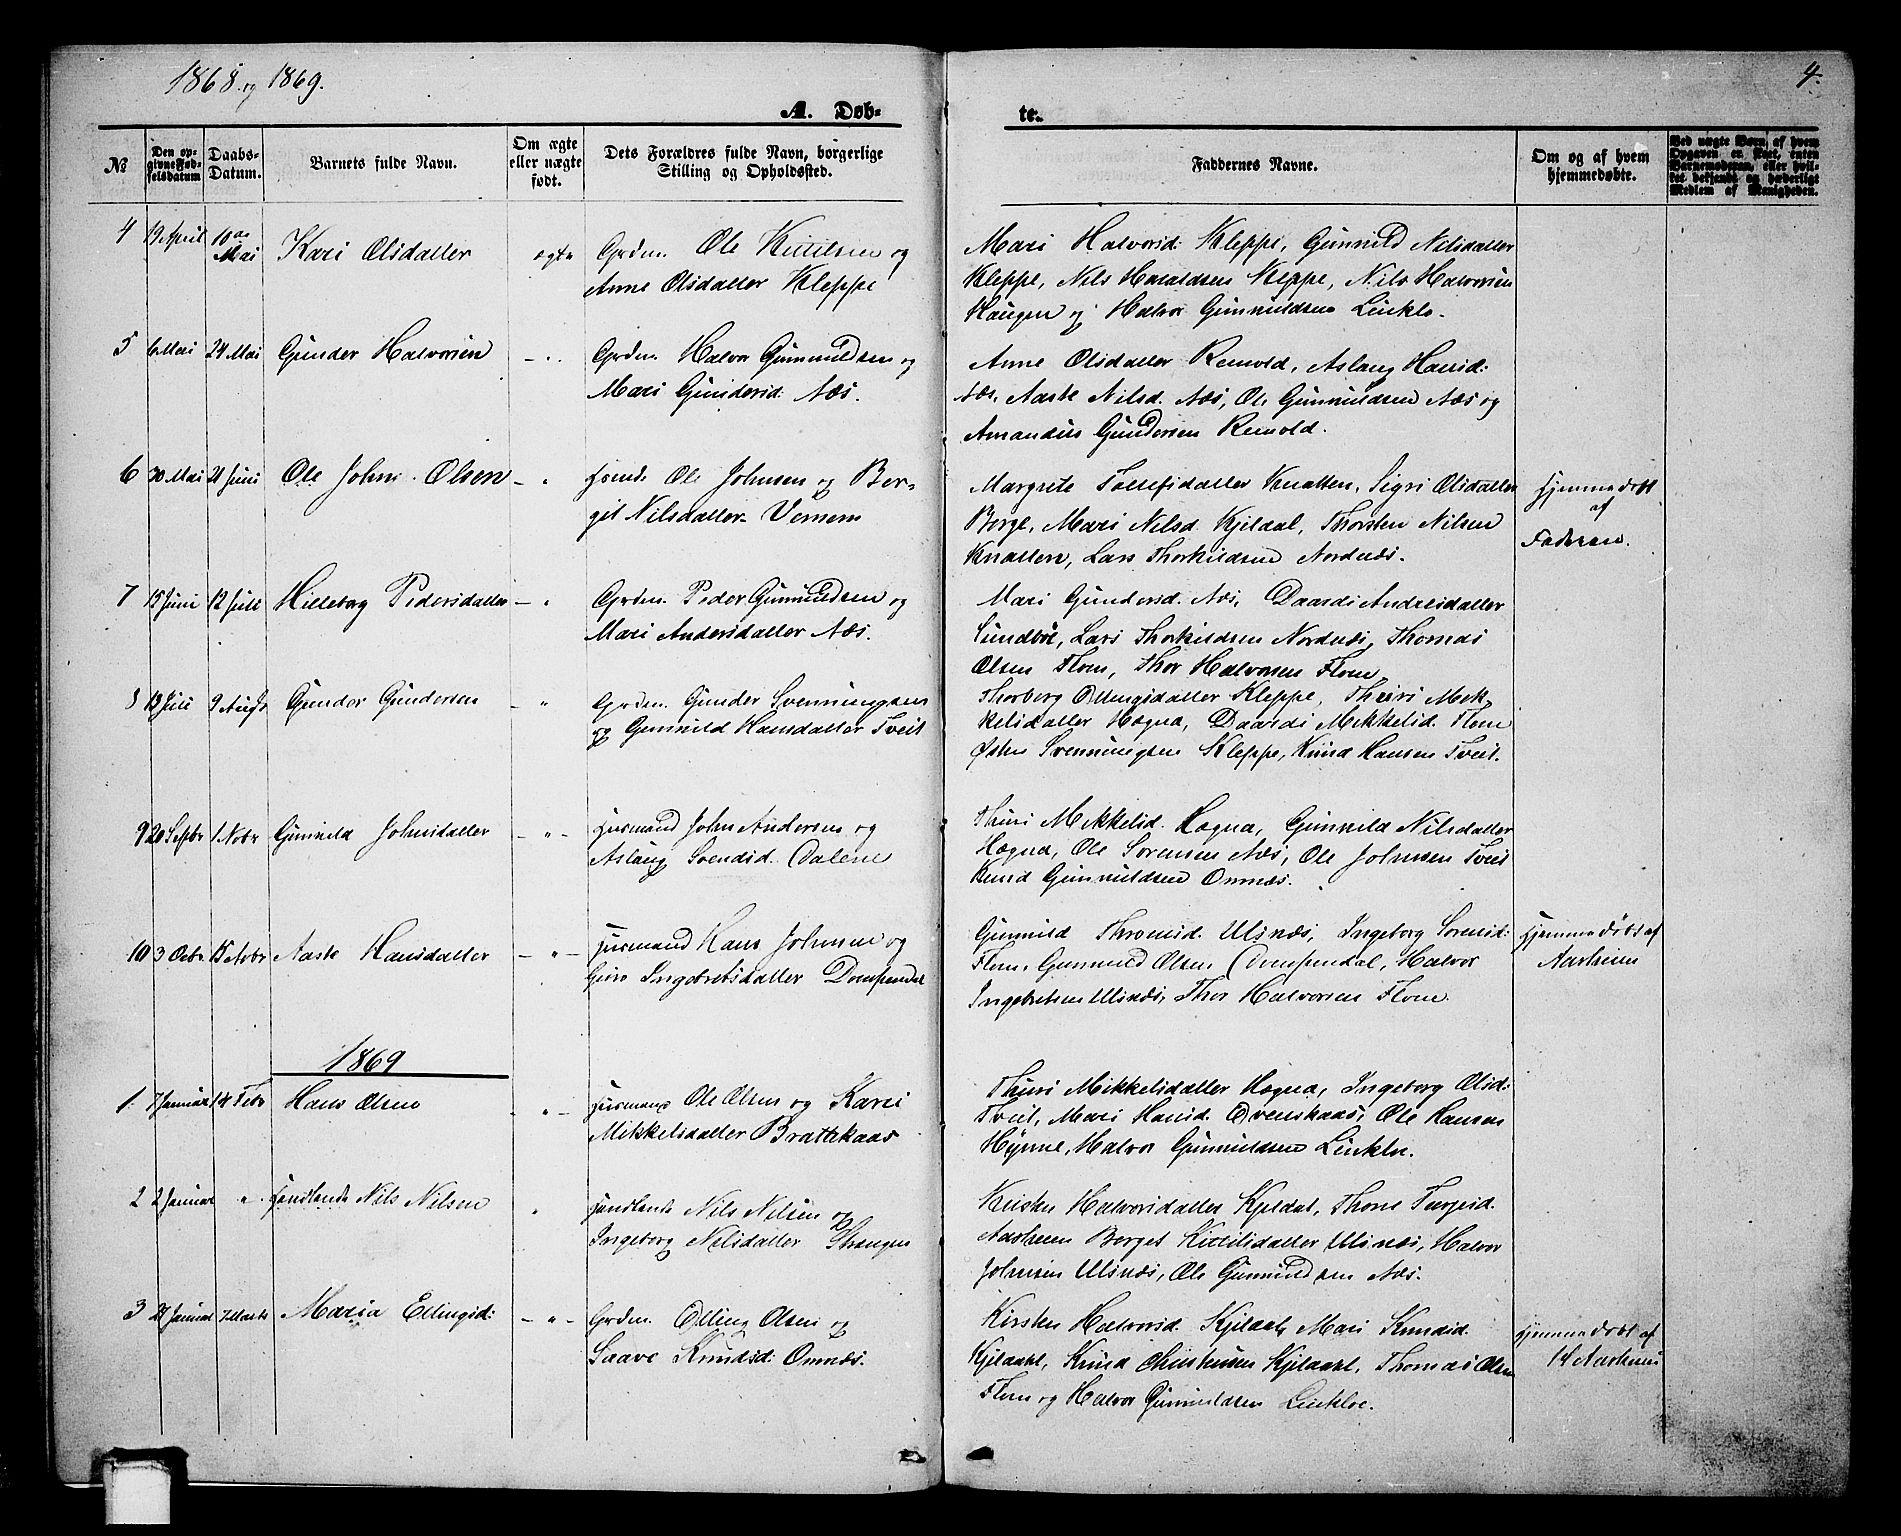 SAKO, Lunde kirkebøker, G/Gb/L0001: Klokkerbok nr. II 1, 1866-1887, s. 4